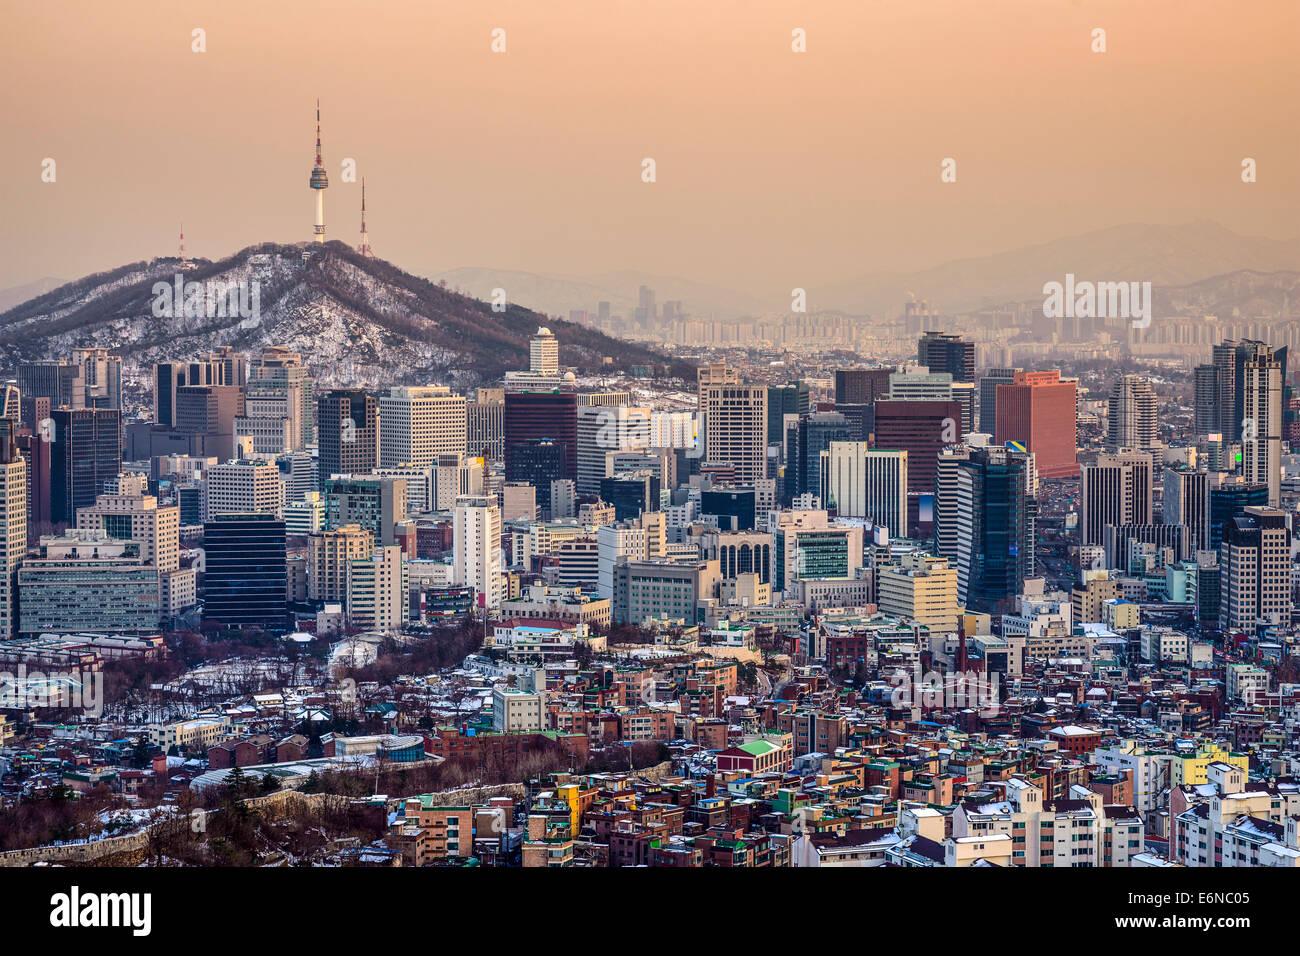 Seoul, South Korea City skyline. - Stock Image